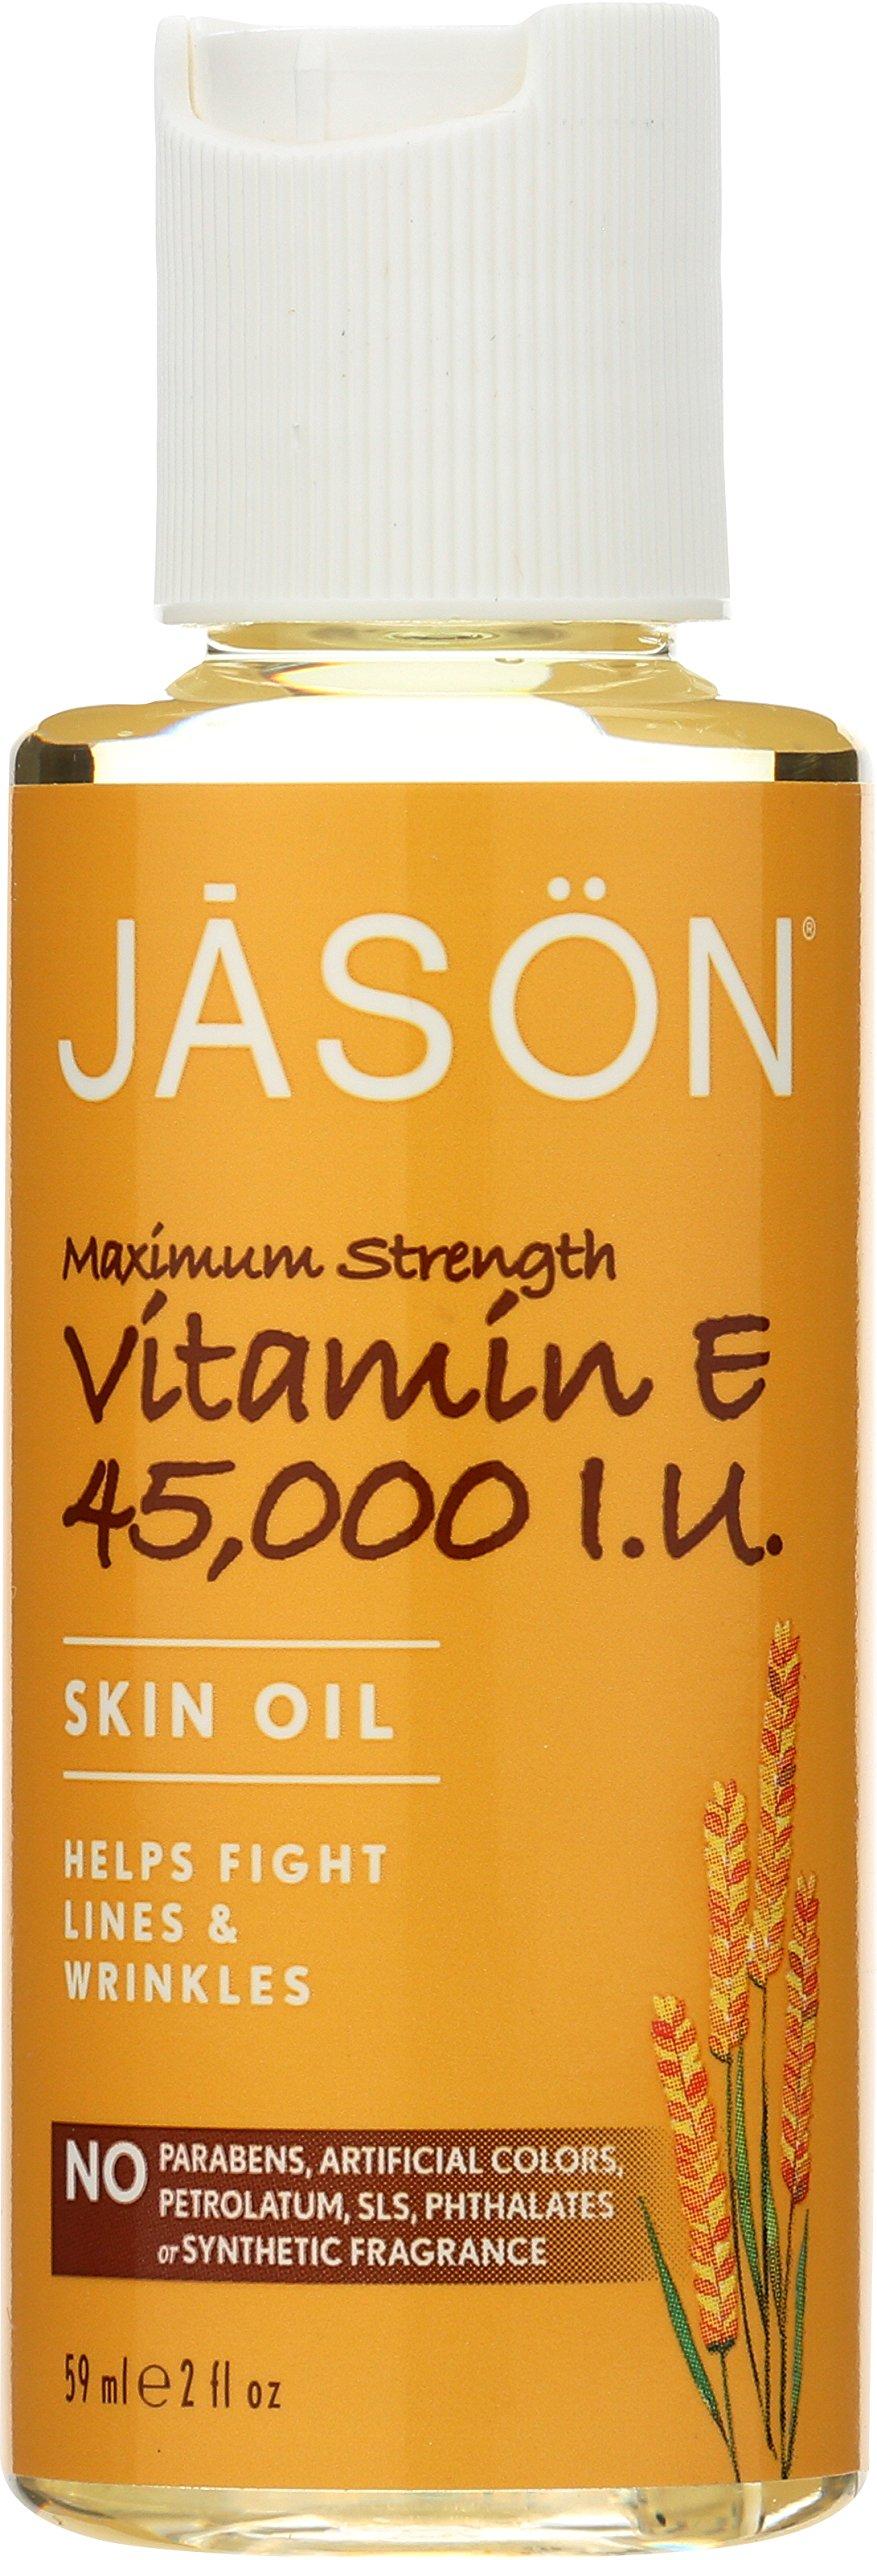 JASON Vitamin E 45,000 IU Maximum Strength Oil, 2 Ounce